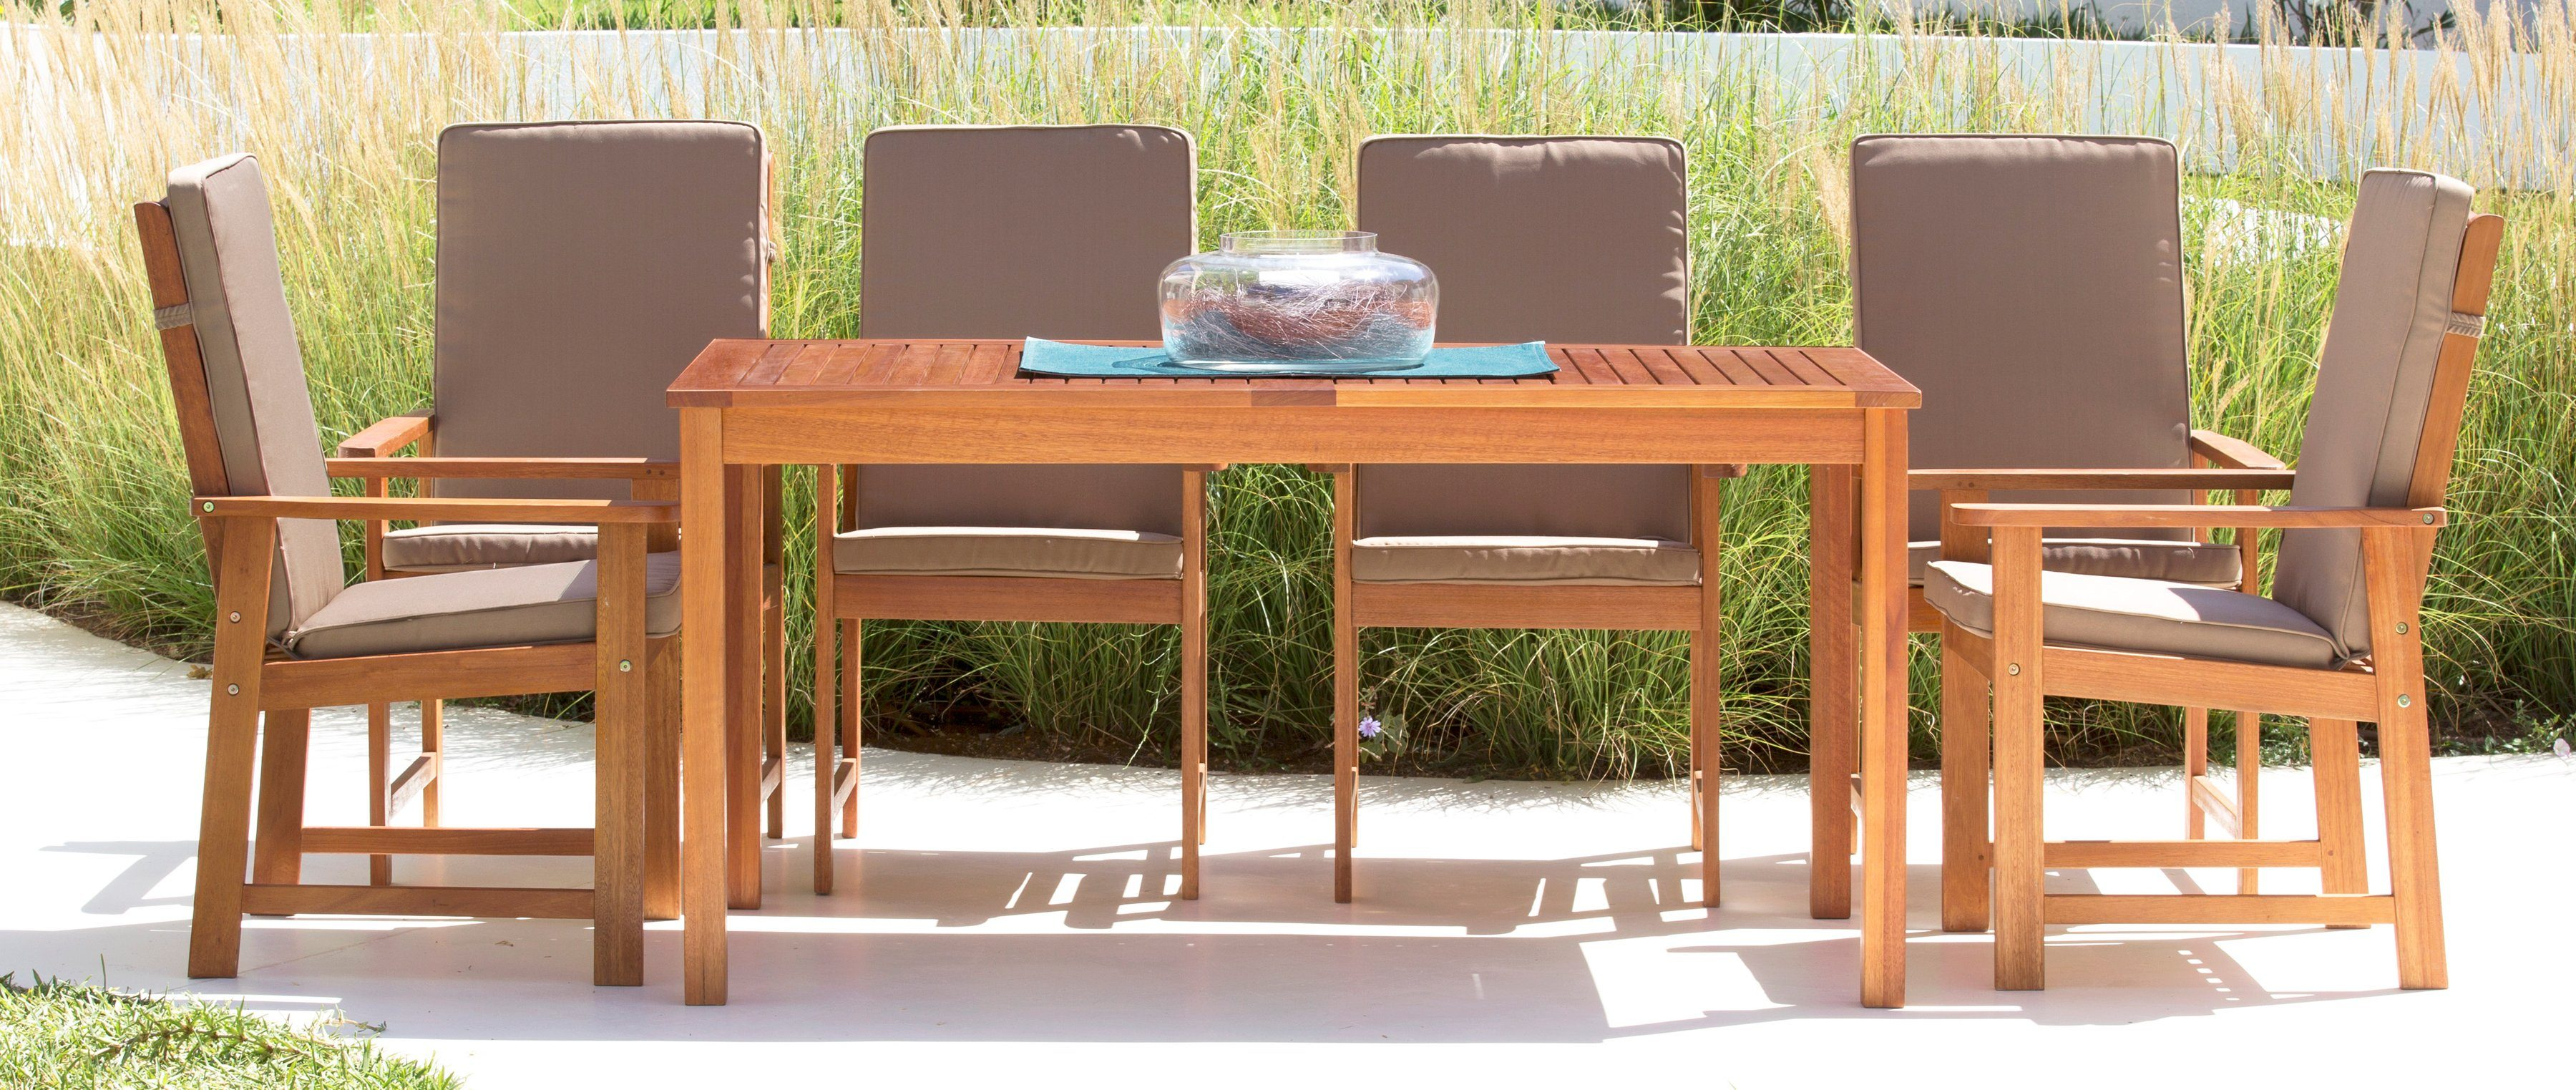 Gartenmöbelset »Vancouver«, 13-tgl., 6 Sessel, Tisch 150x80 cm, Eukalyptusholz, braun